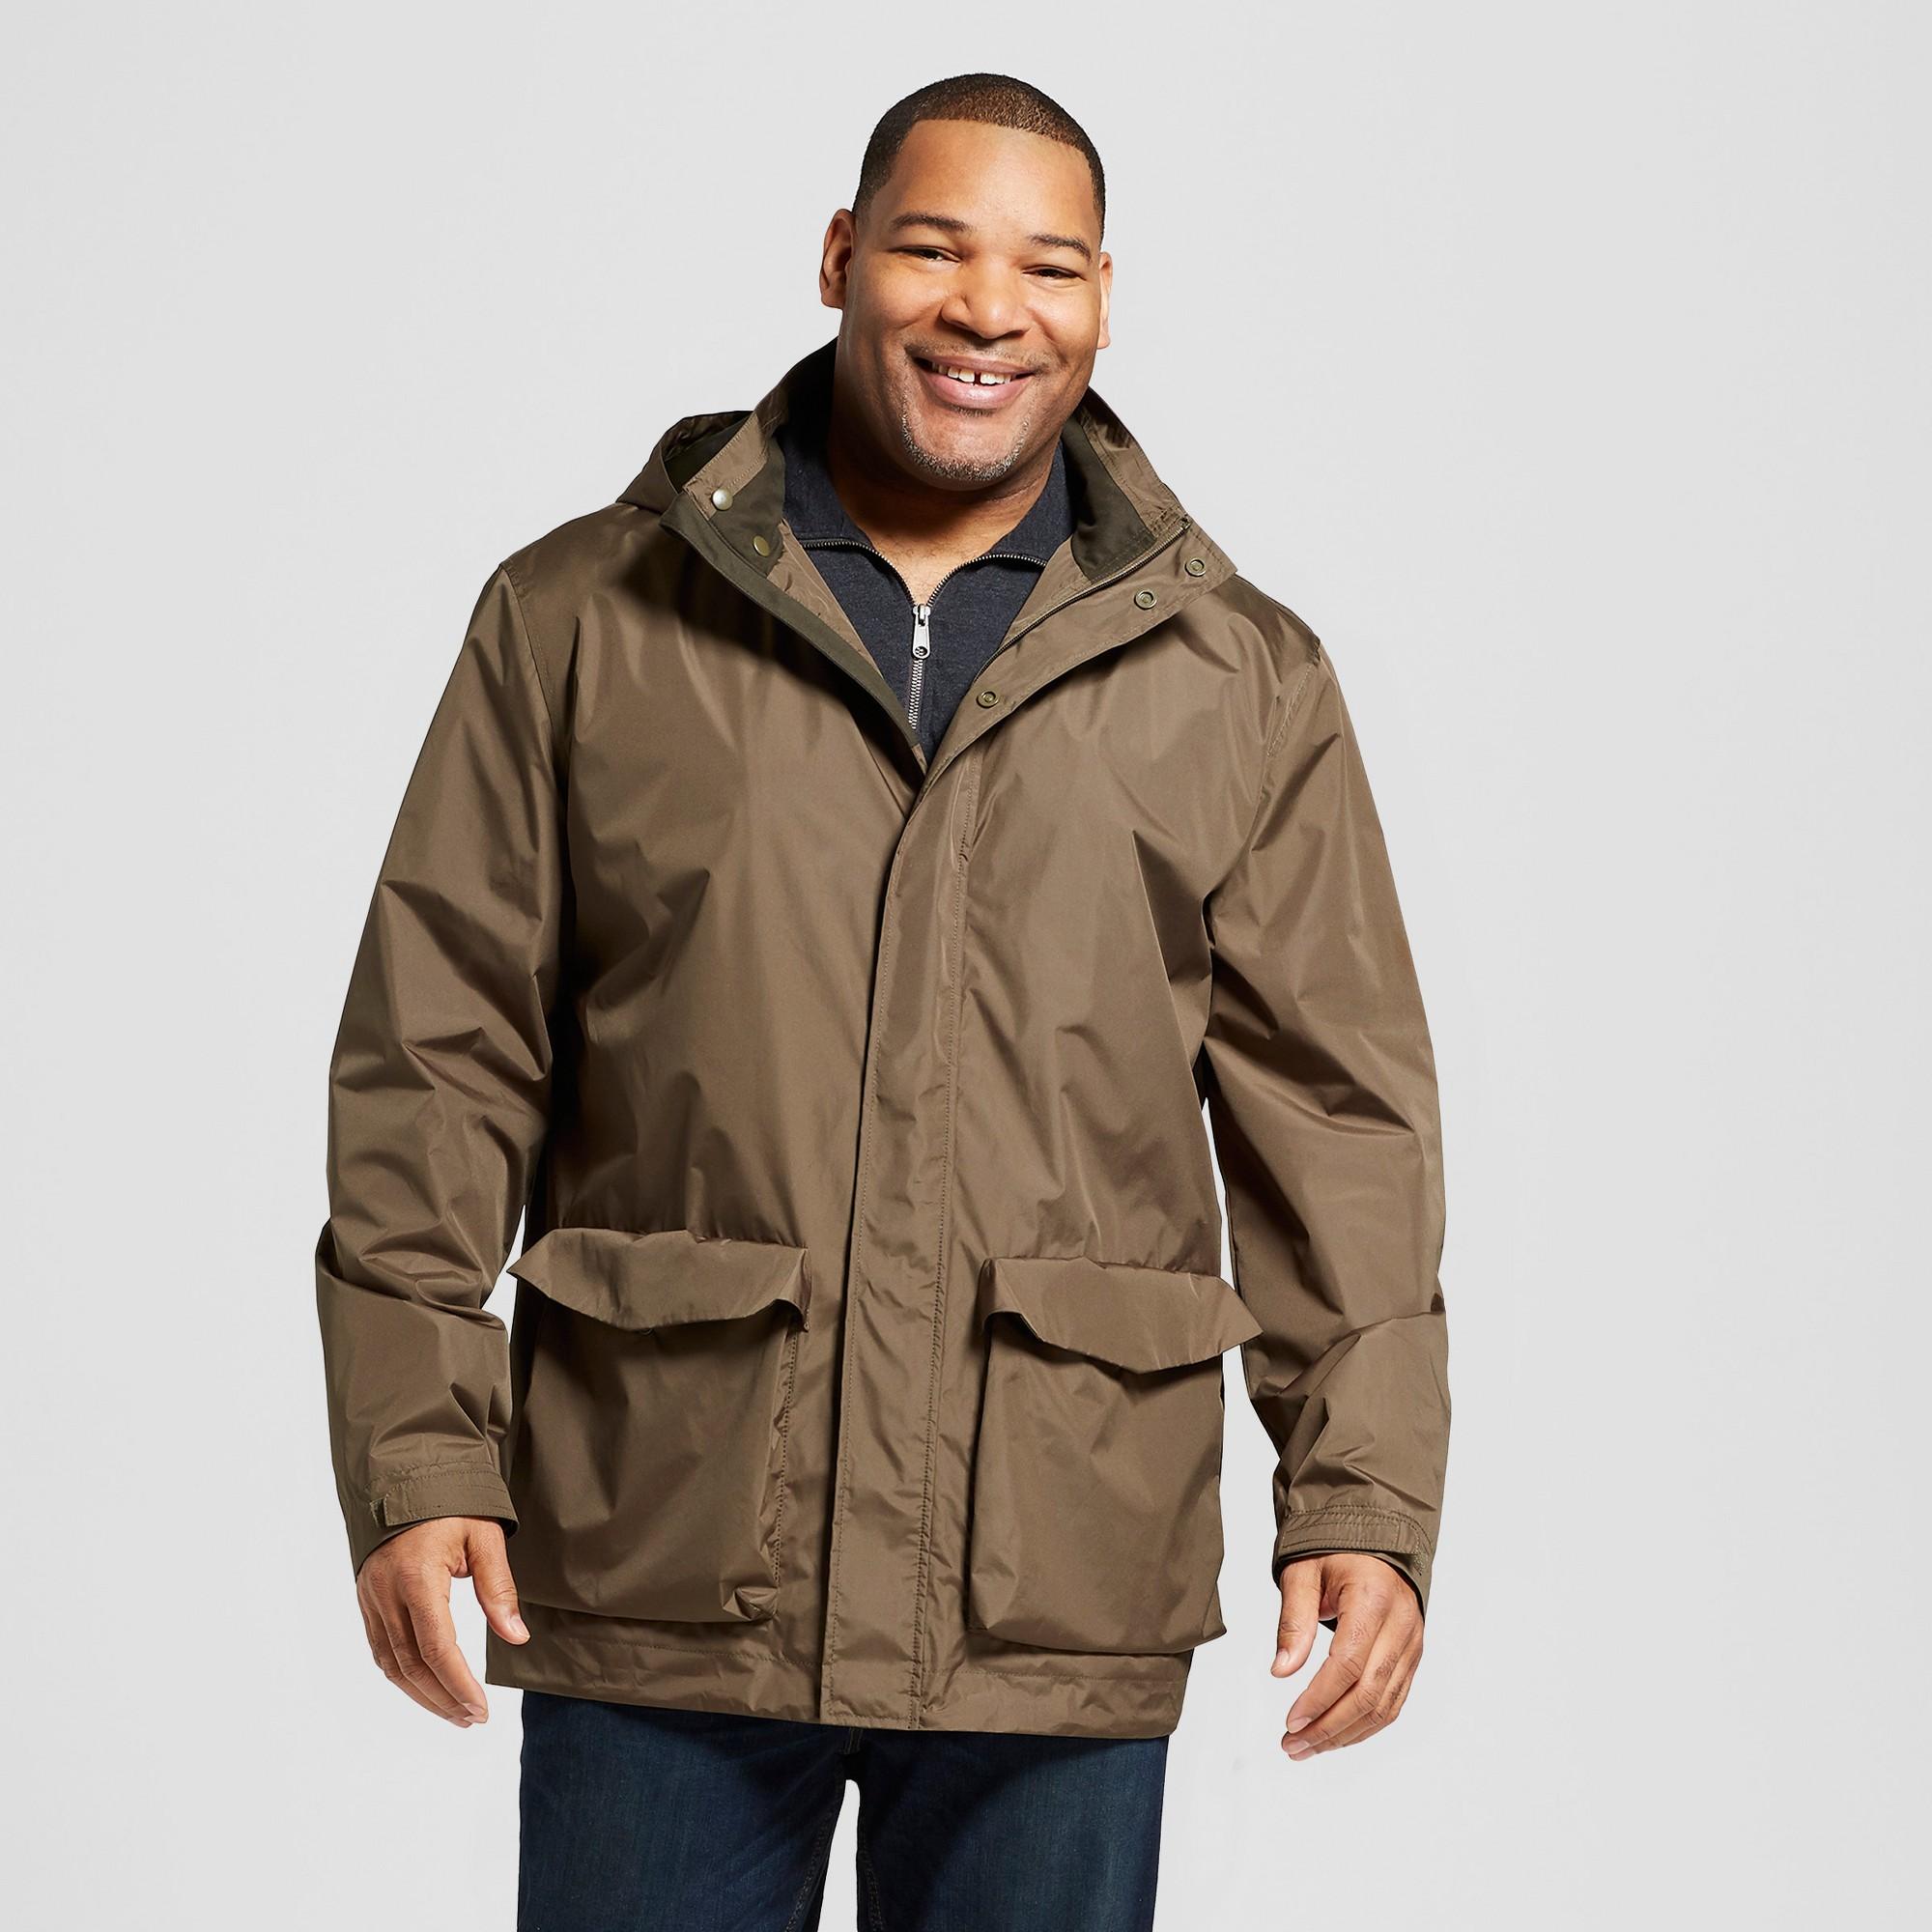 ab74a138d Men's Tall Outerwear Rain Jacket - Goodfellow & Co Olive XL Tall, Muddied  Basil